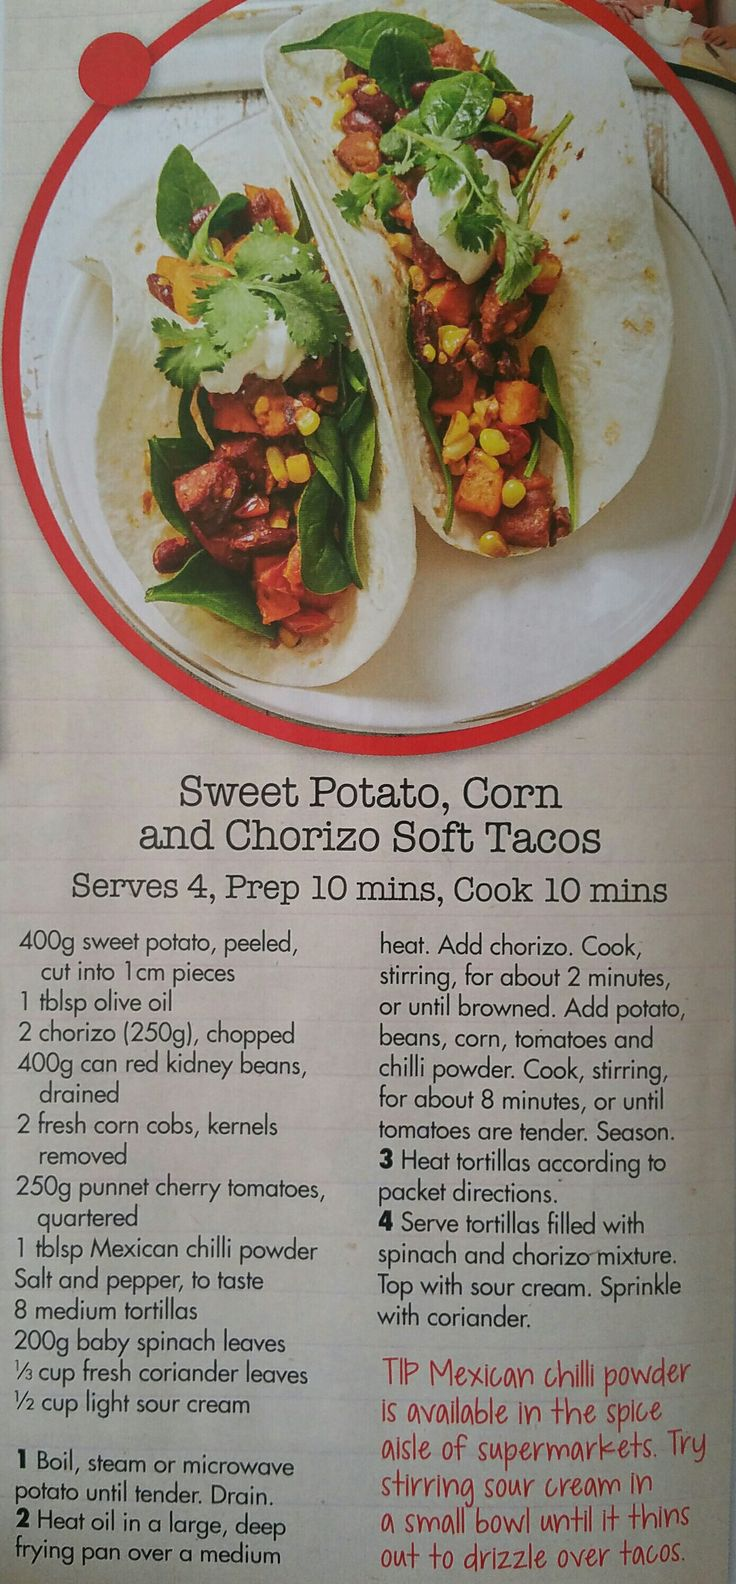 Sweet potato,  corn and chorizo soft tacos